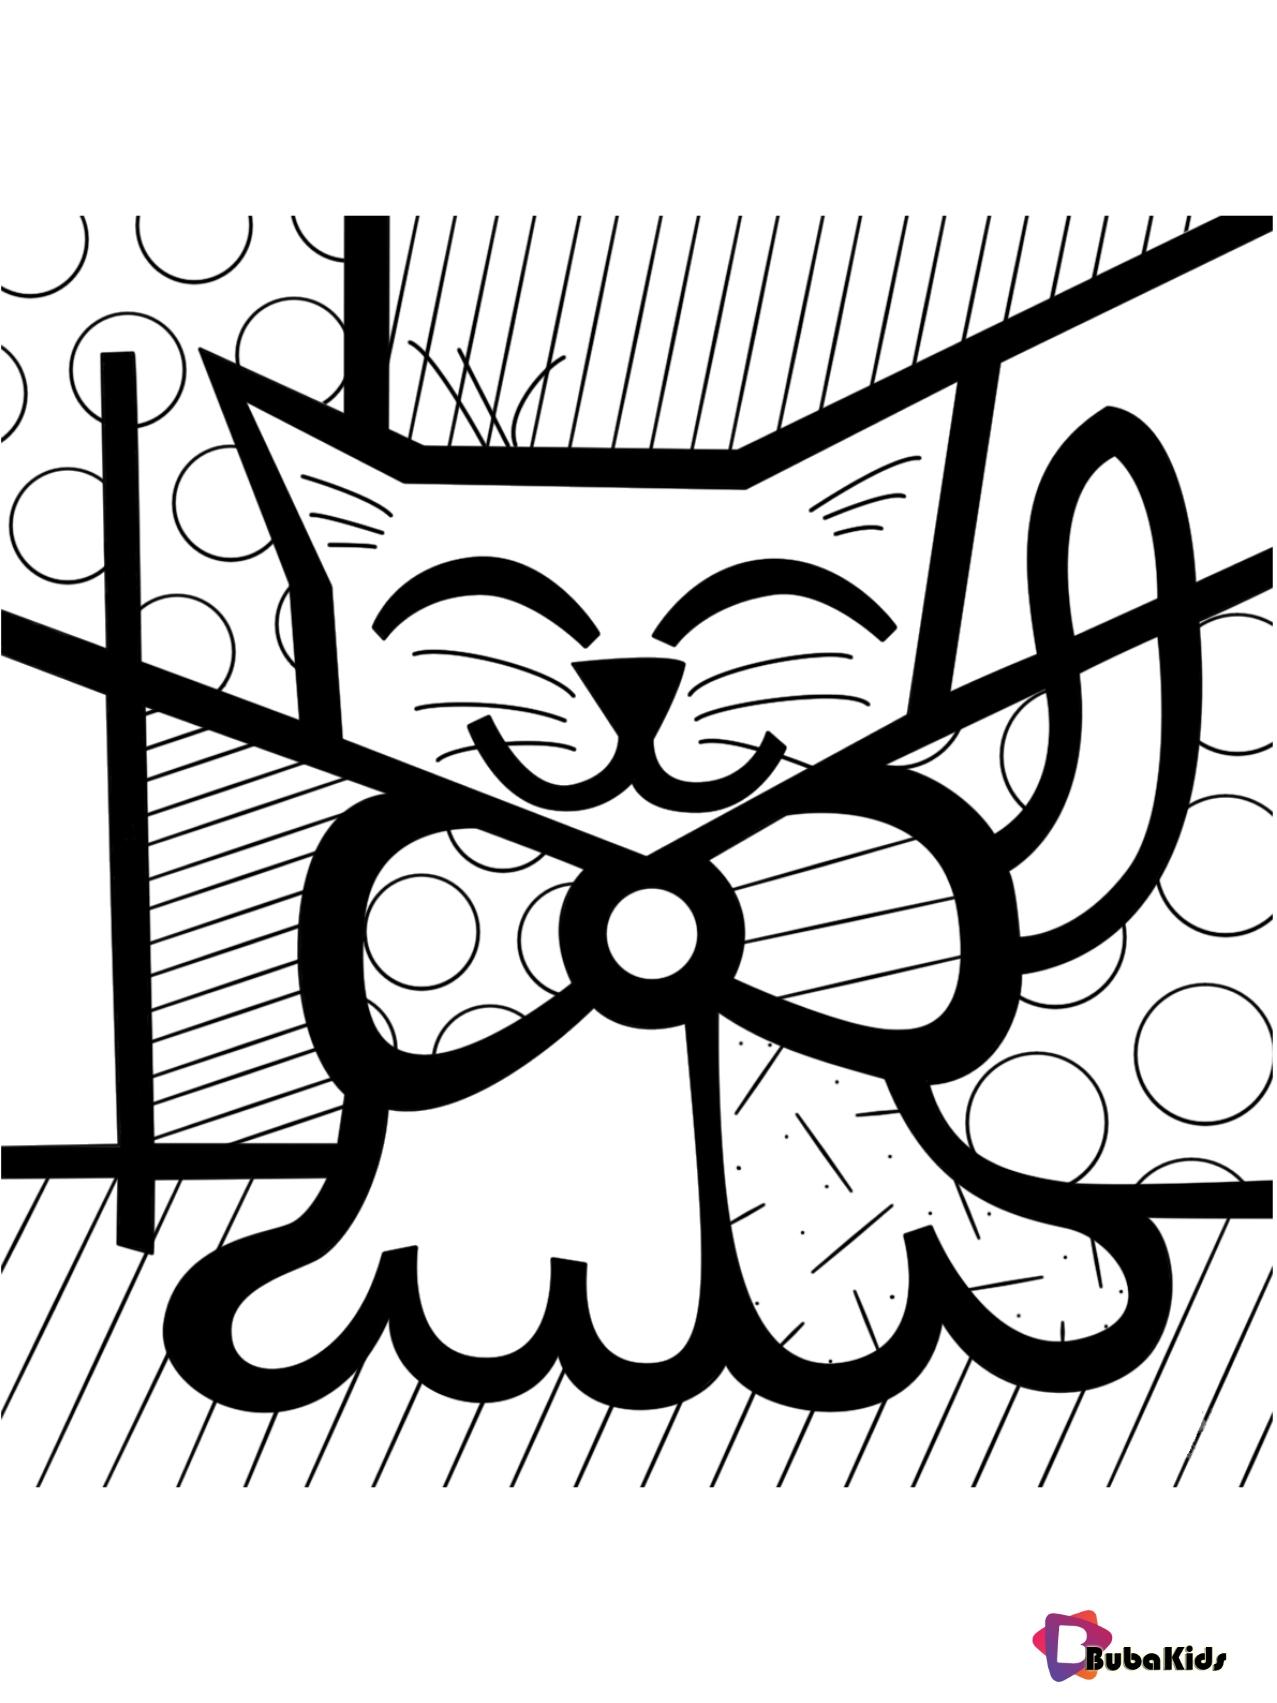 Cute Cat by Romero Britto coloring page Wallpaper